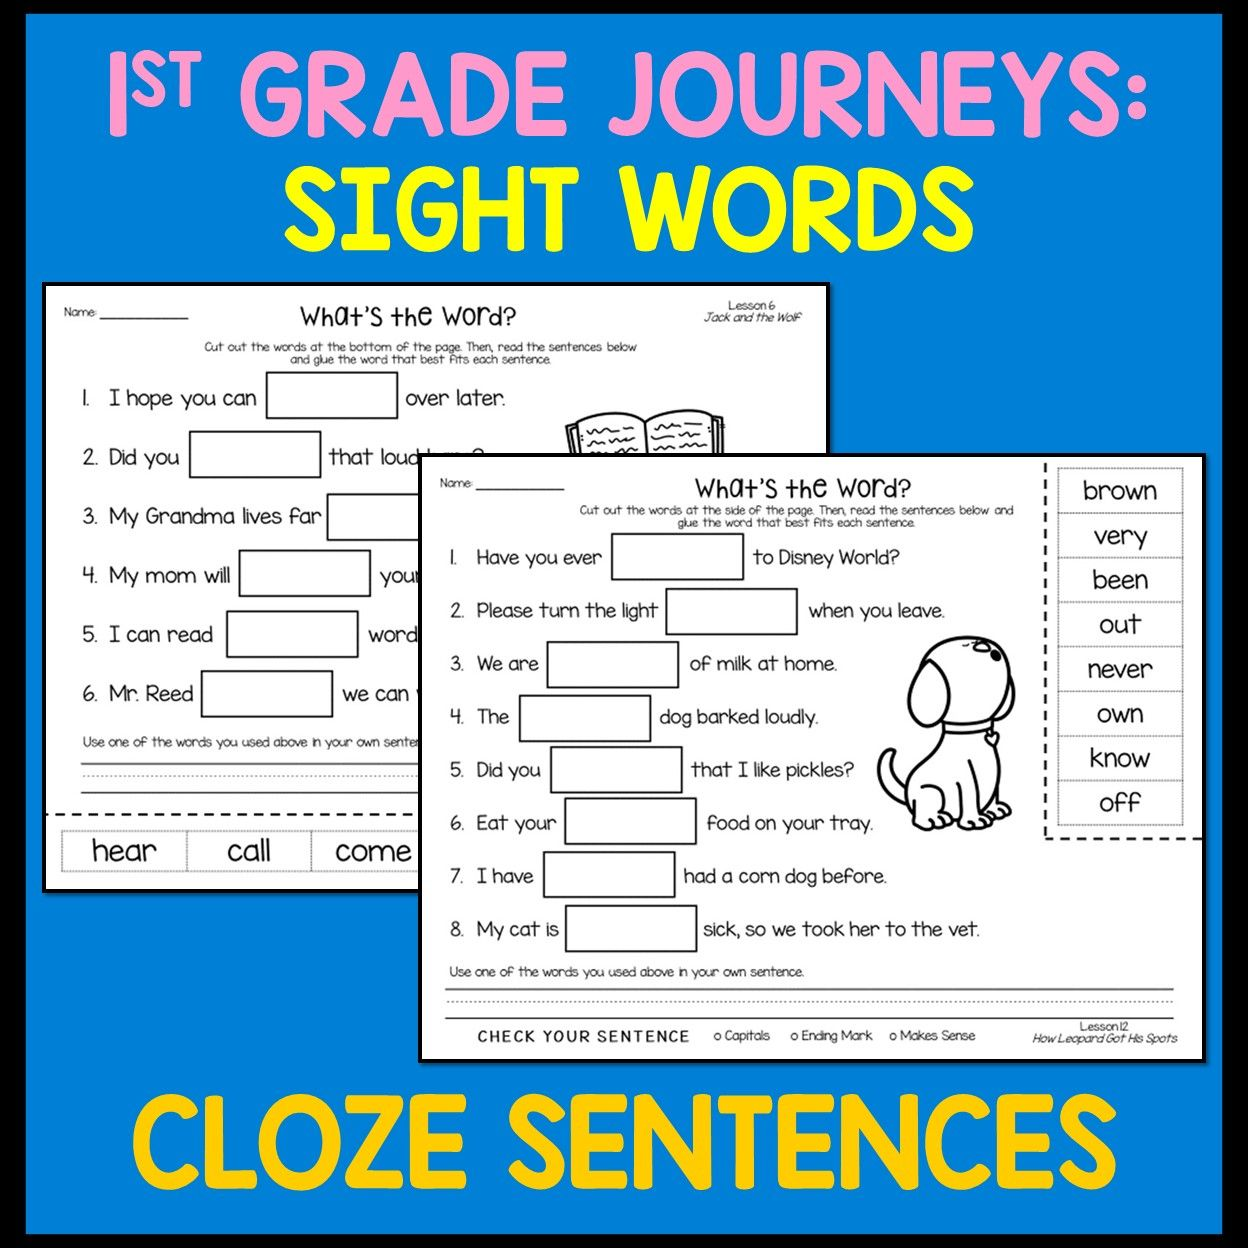 Cloze Sentences for 1st Grade Journeys Sight Words   Sight words [ 1248 x 1248 Pixel ]